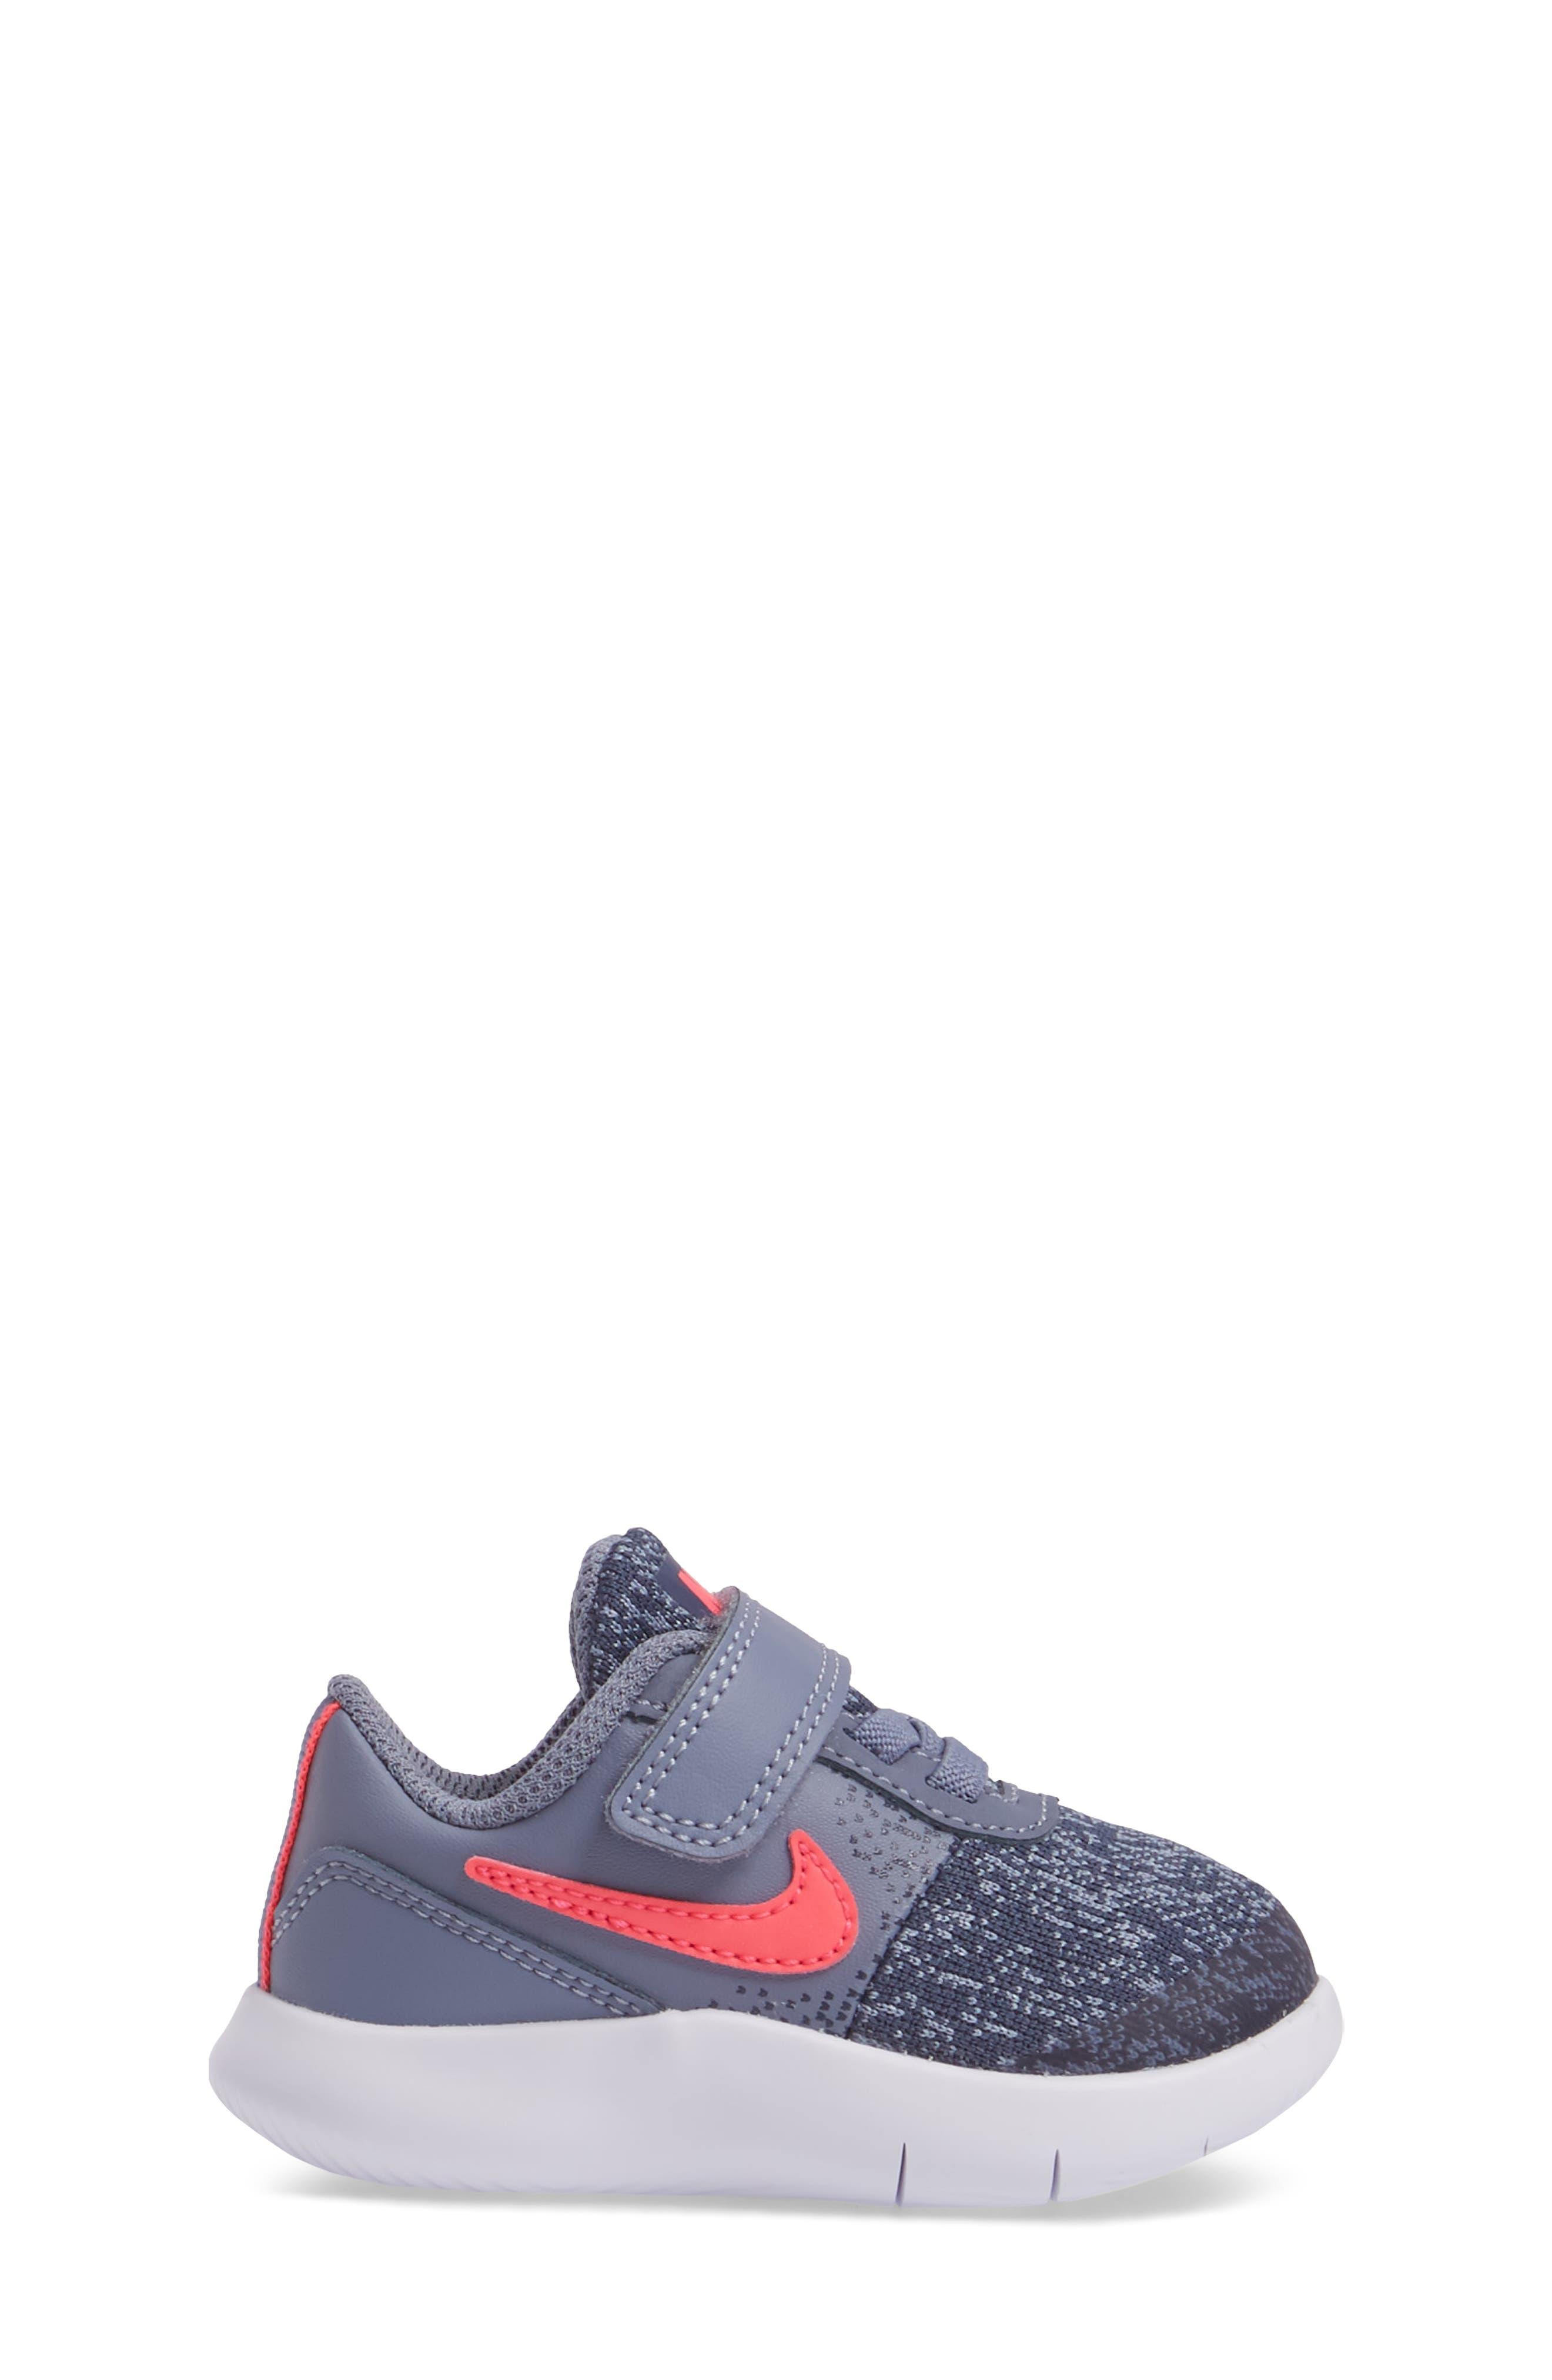 Flex Contact Sneaker,                             Alternate thumbnail 3, color,                             Racer Pink/ Thunder Blue